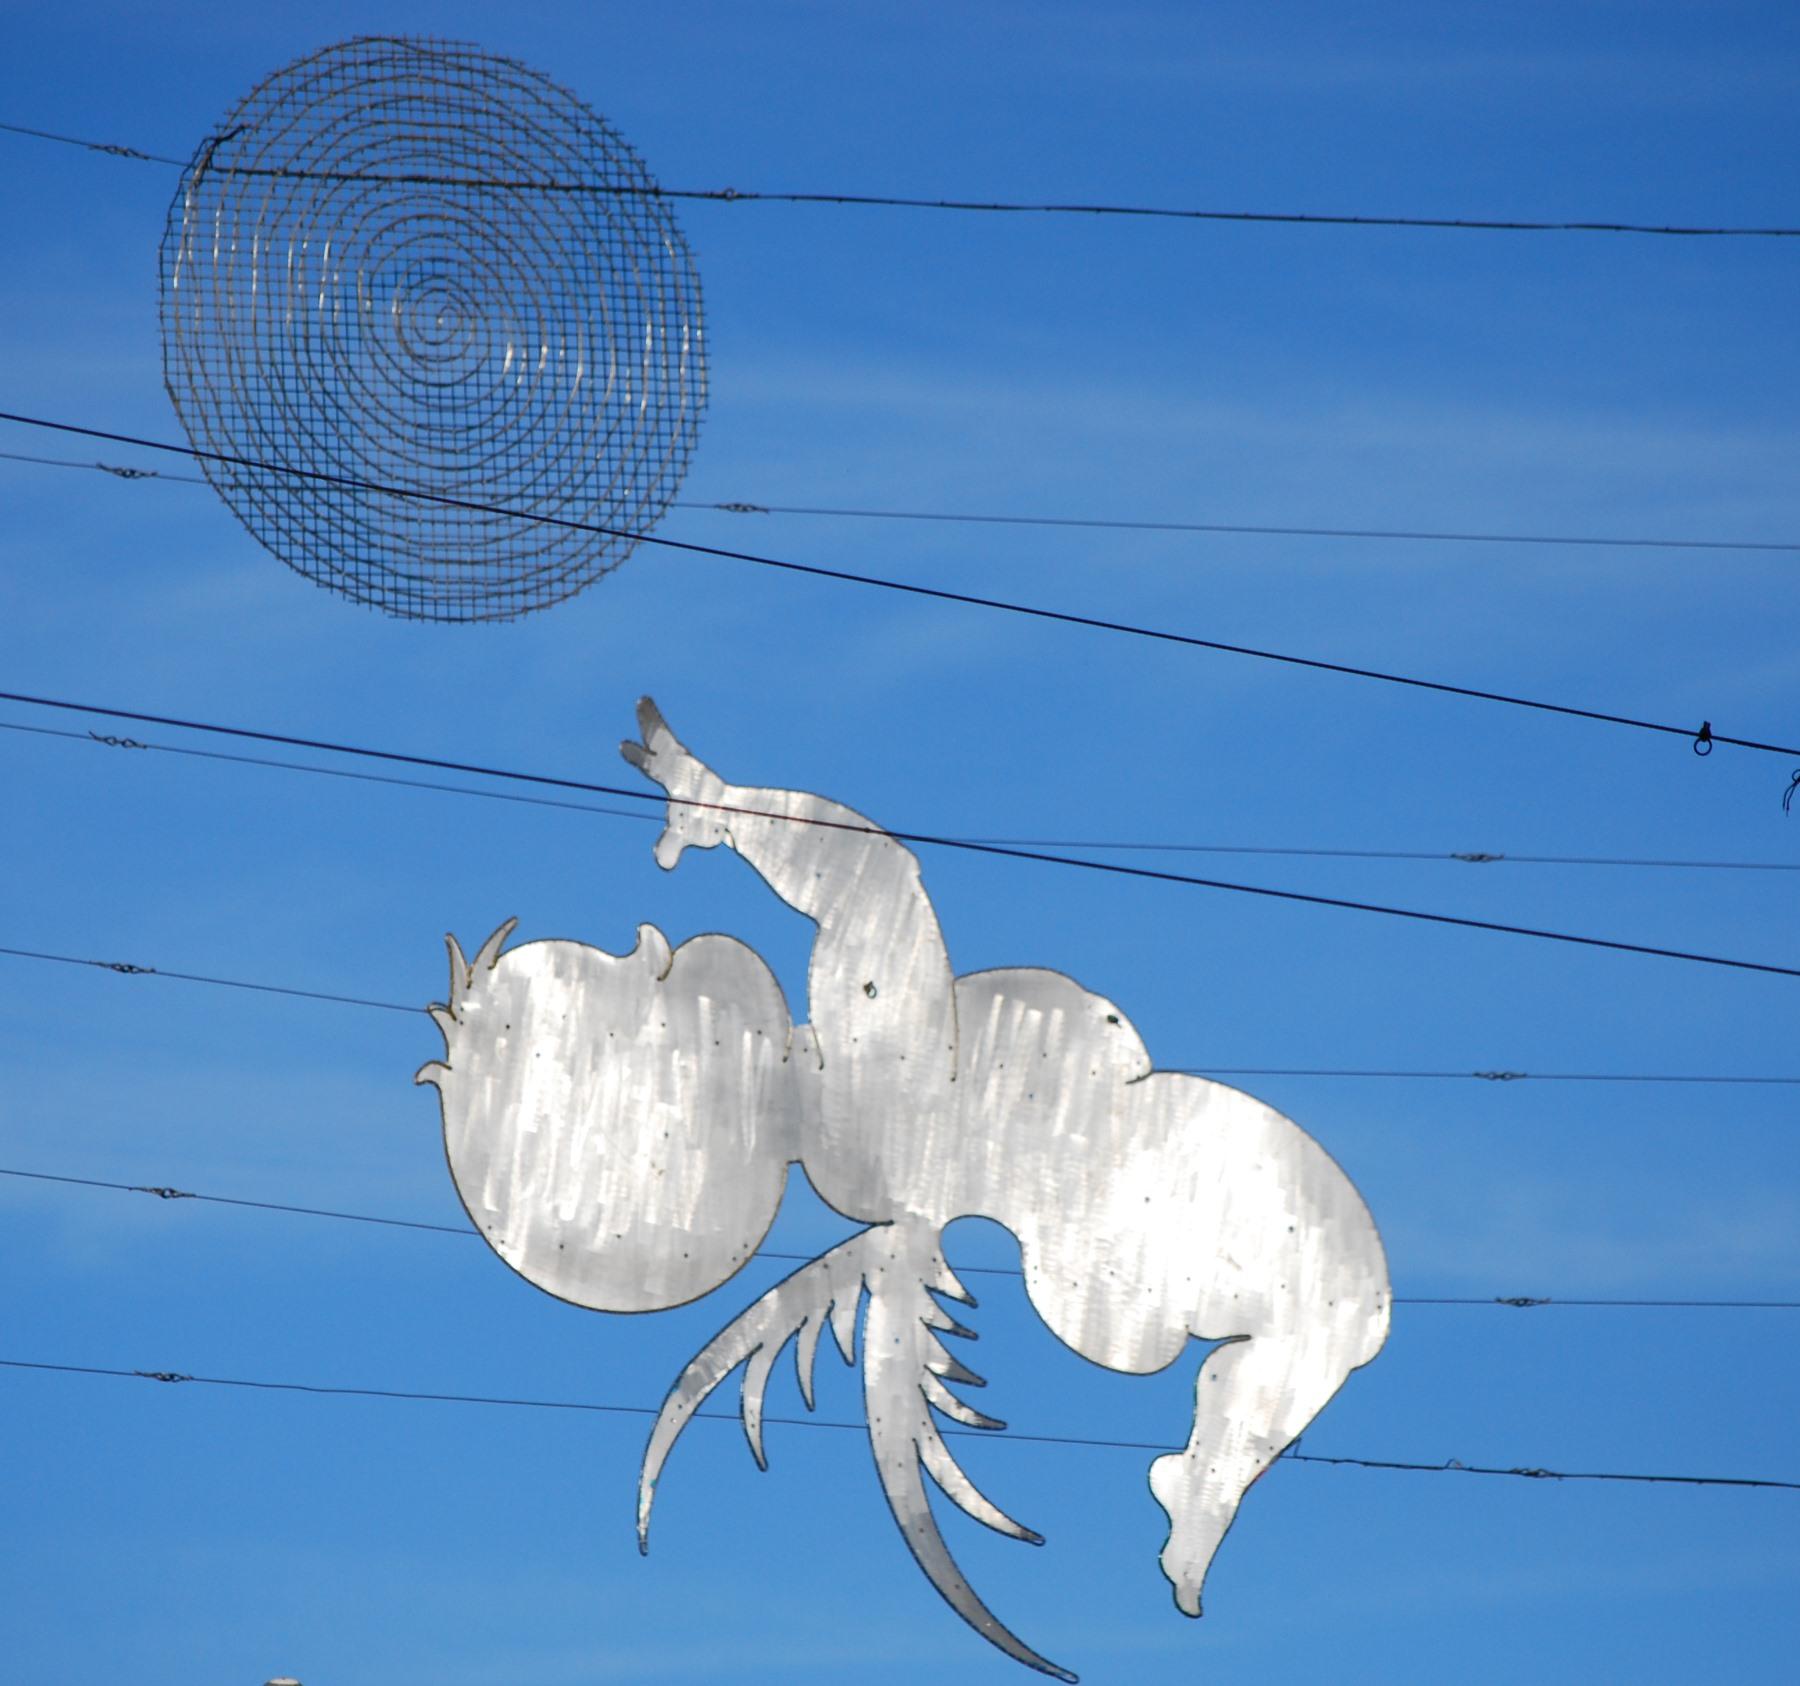 Weihnachtsbeleuchtung Engel.Datei Engel Weihnachtsbeleuchtung Jpg Linzwiki